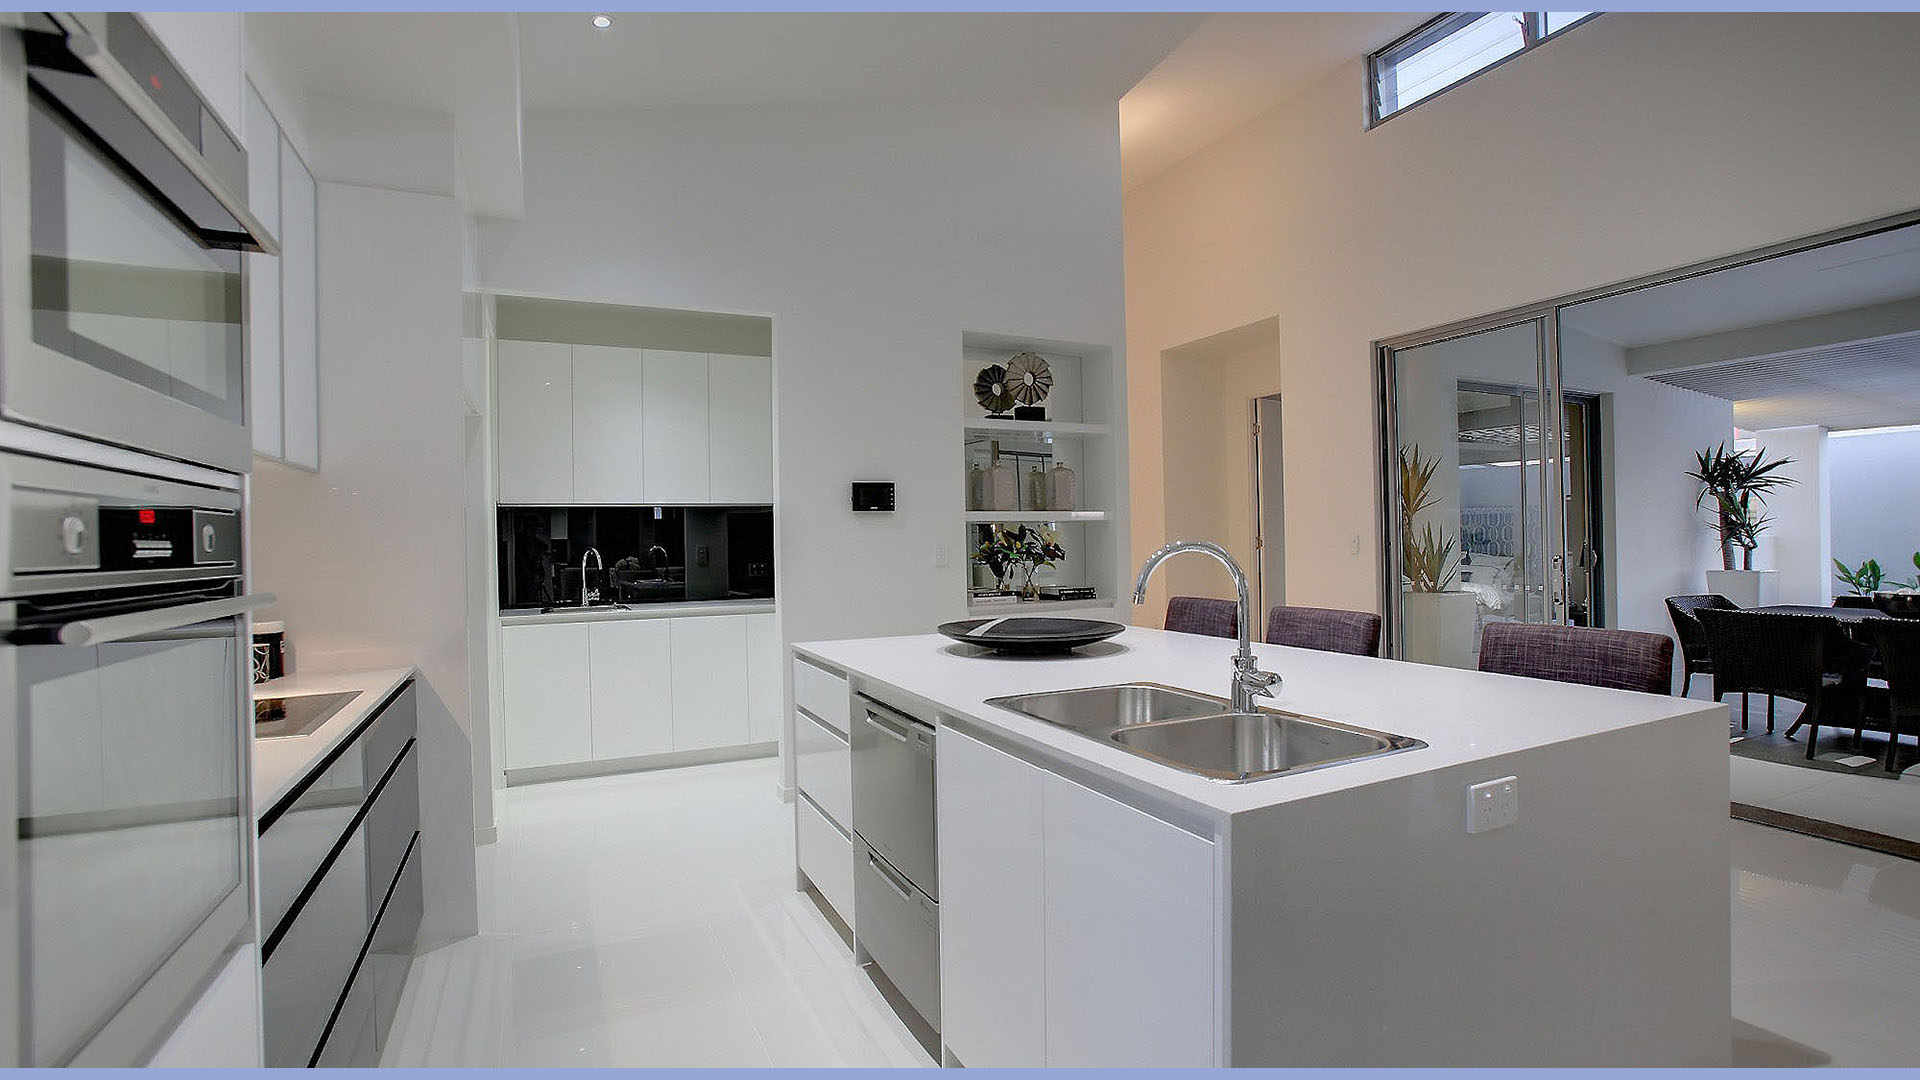 Jantree - 006 - Kitchen 02